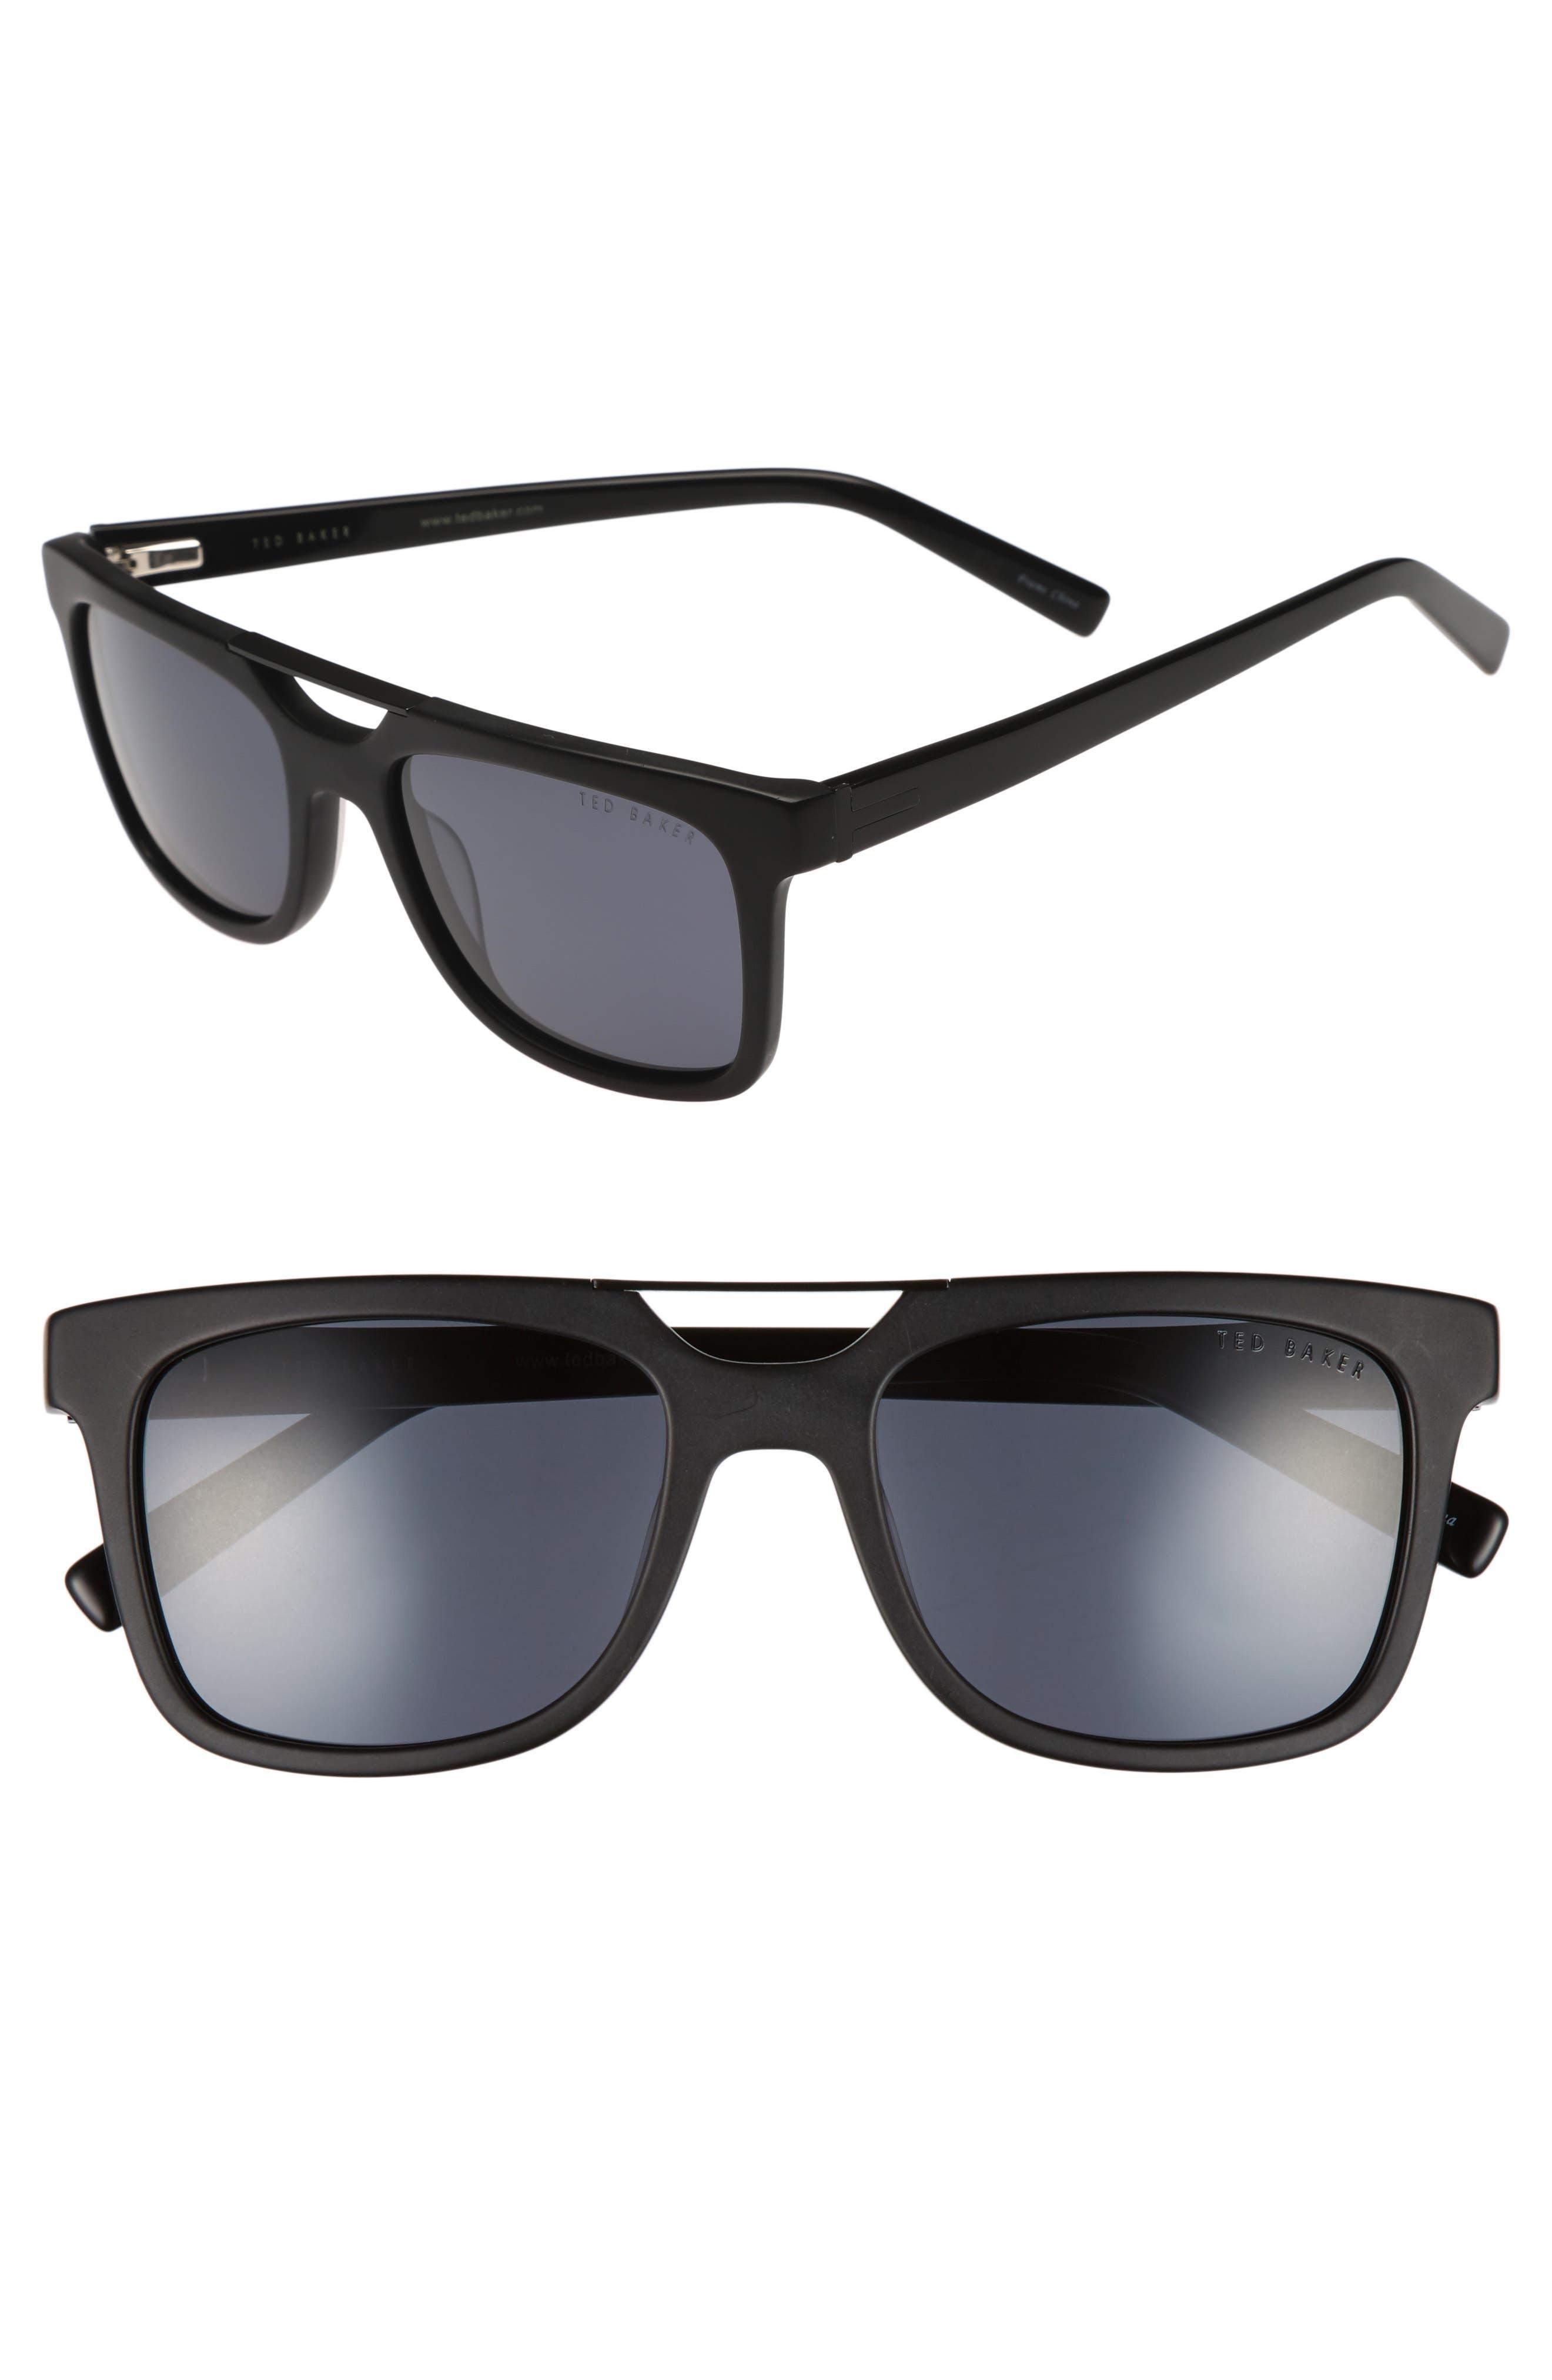 54mm Polarized Sunglasses,                             Main thumbnail 1, color,                             001